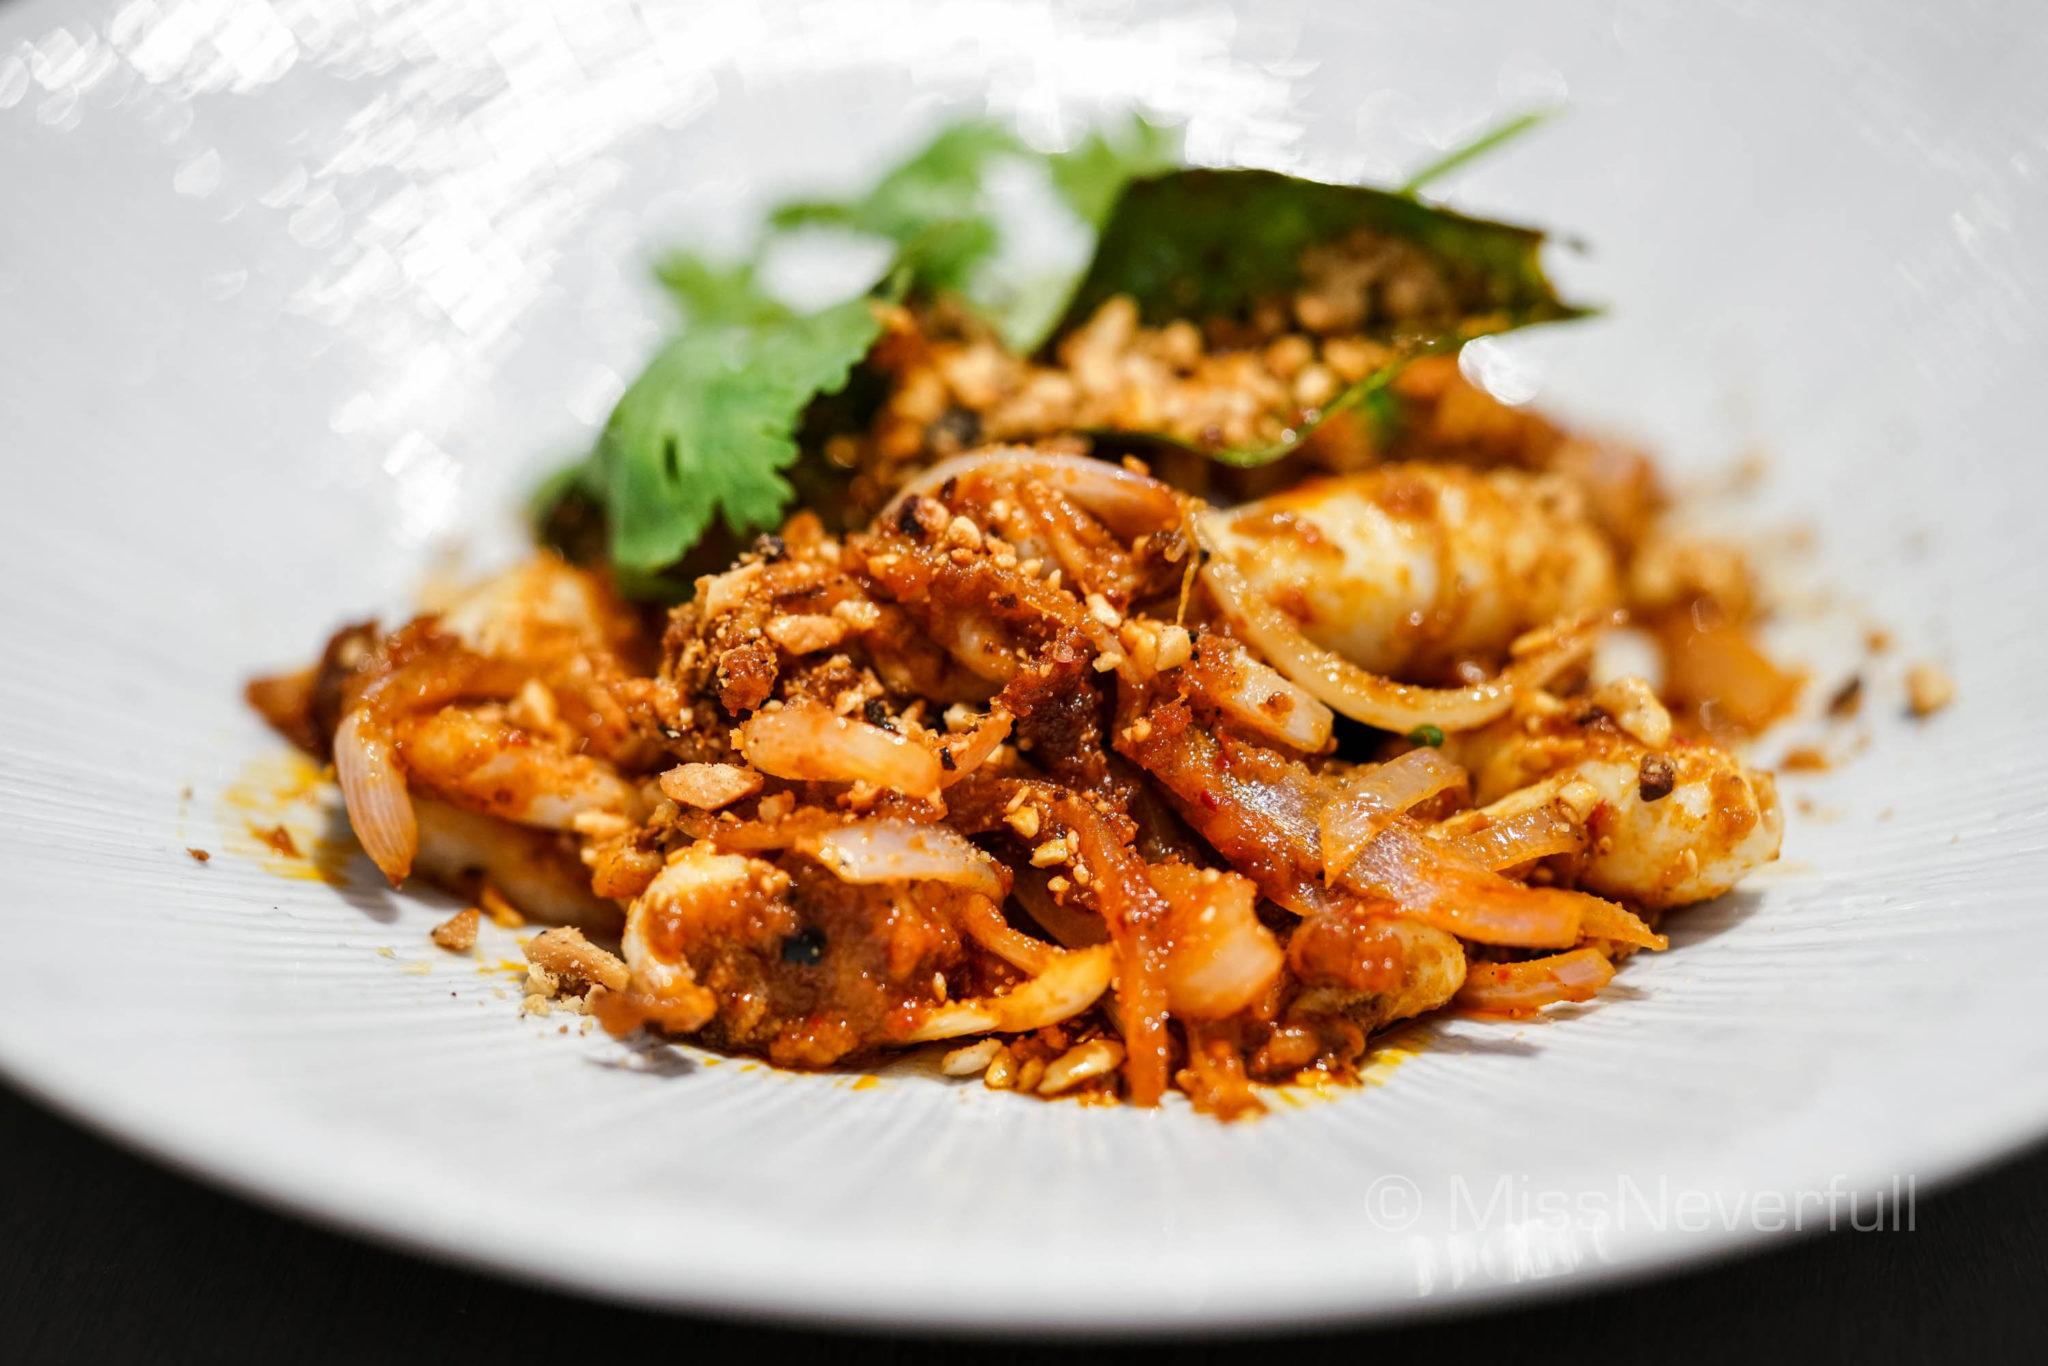 Wok Fried Baby Squid Berempah, Kaffir Lime Leaf, Roasted Peanuts